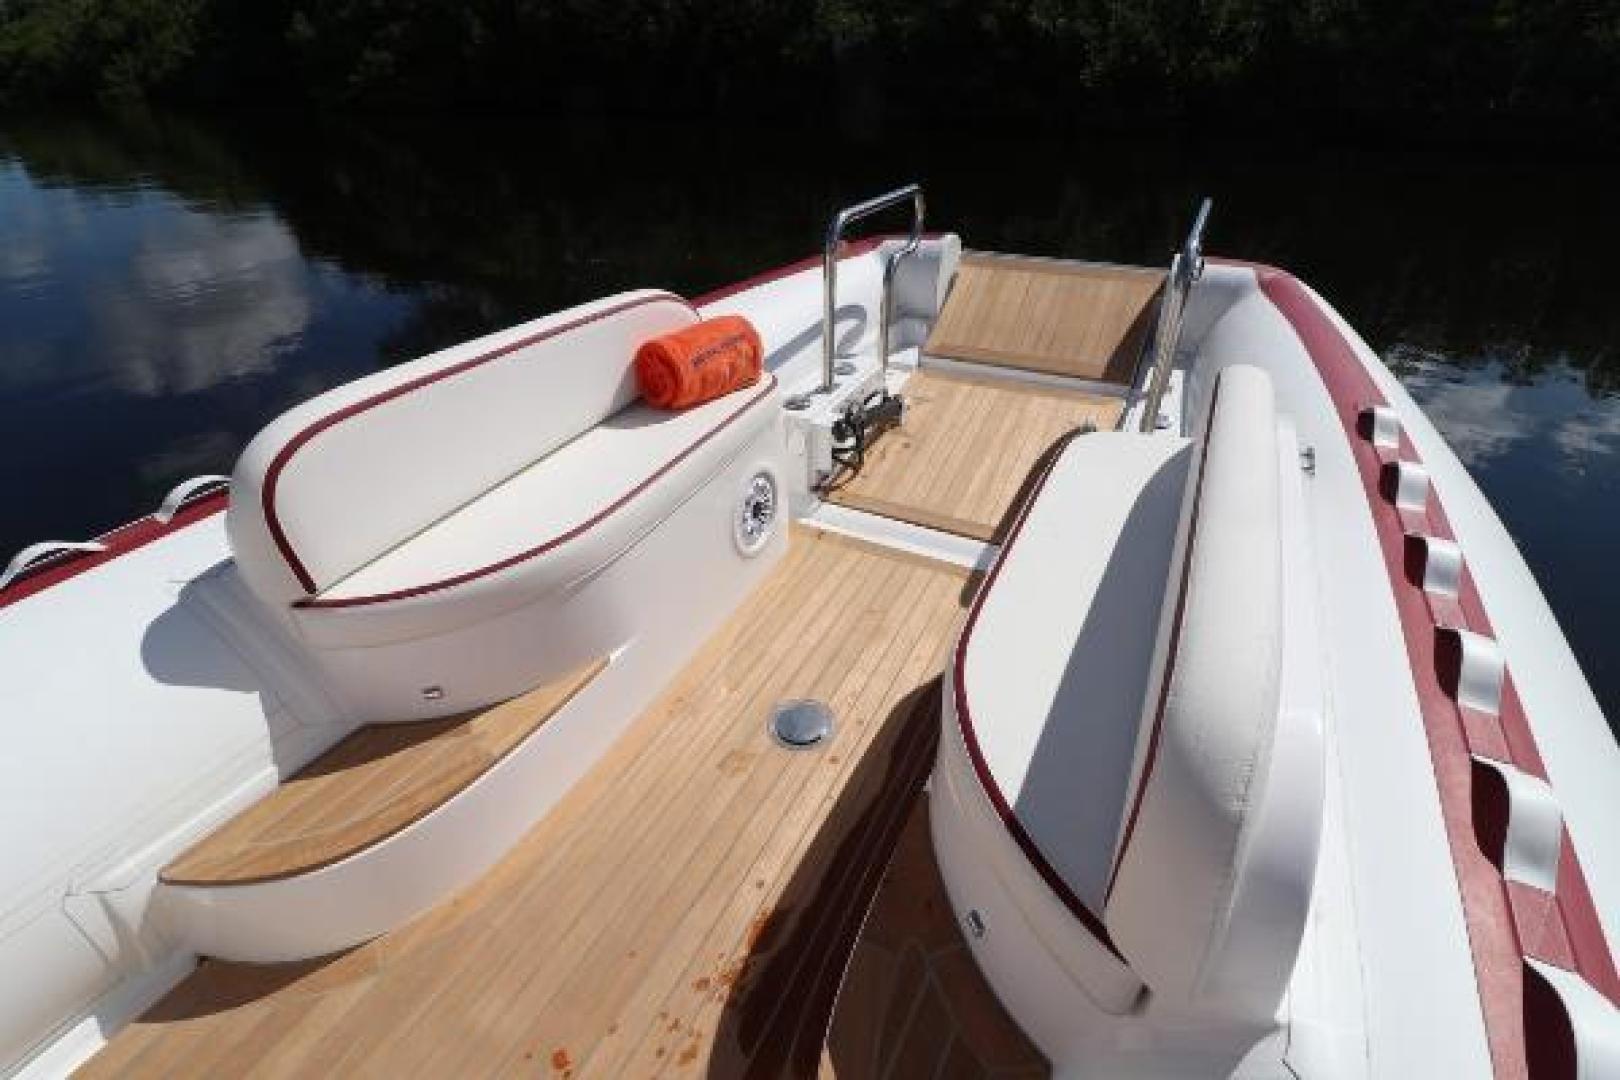 Novurania-Catamaran 24 2017-Novurania Catamaran 24 Fort Lauderdale-Florida-United States-1530850   Thumbnail